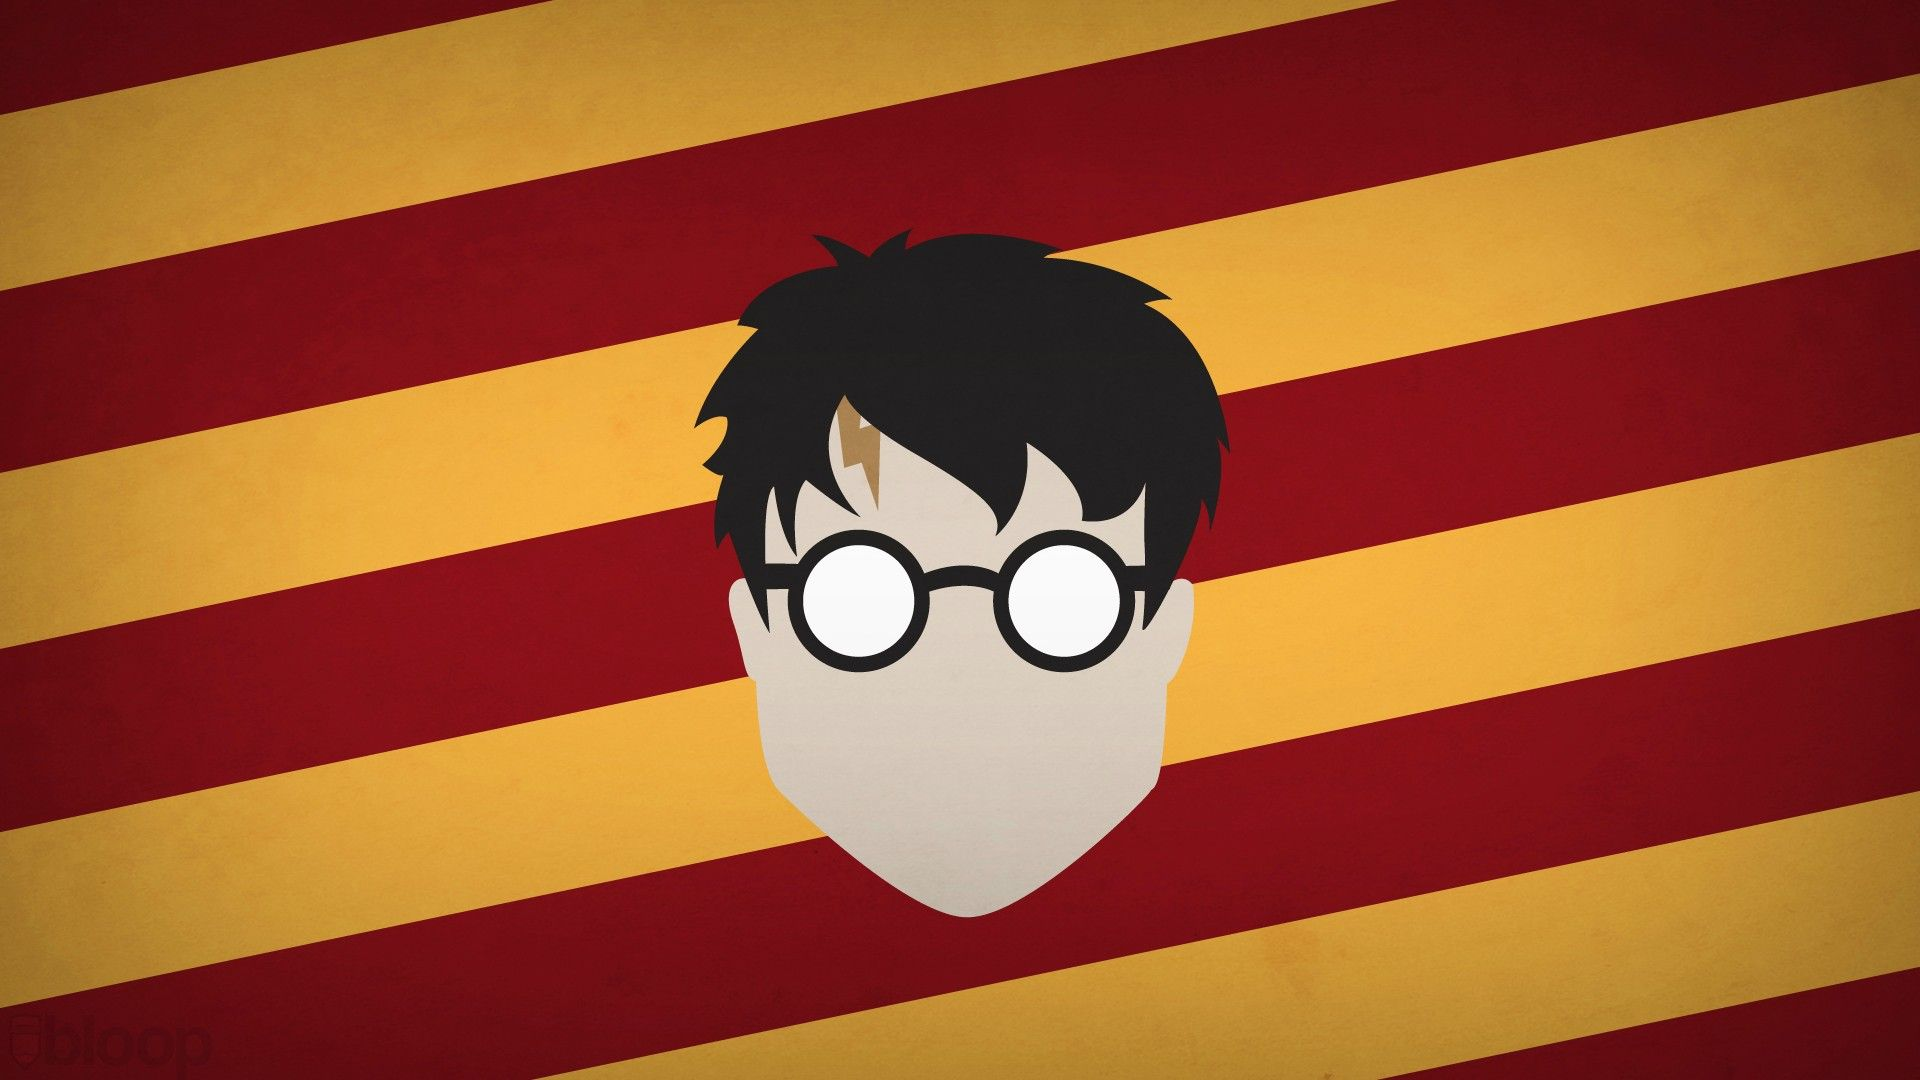 Harry Potter Cartoon Wallpapers - Top Free Harry Potter Cartoon